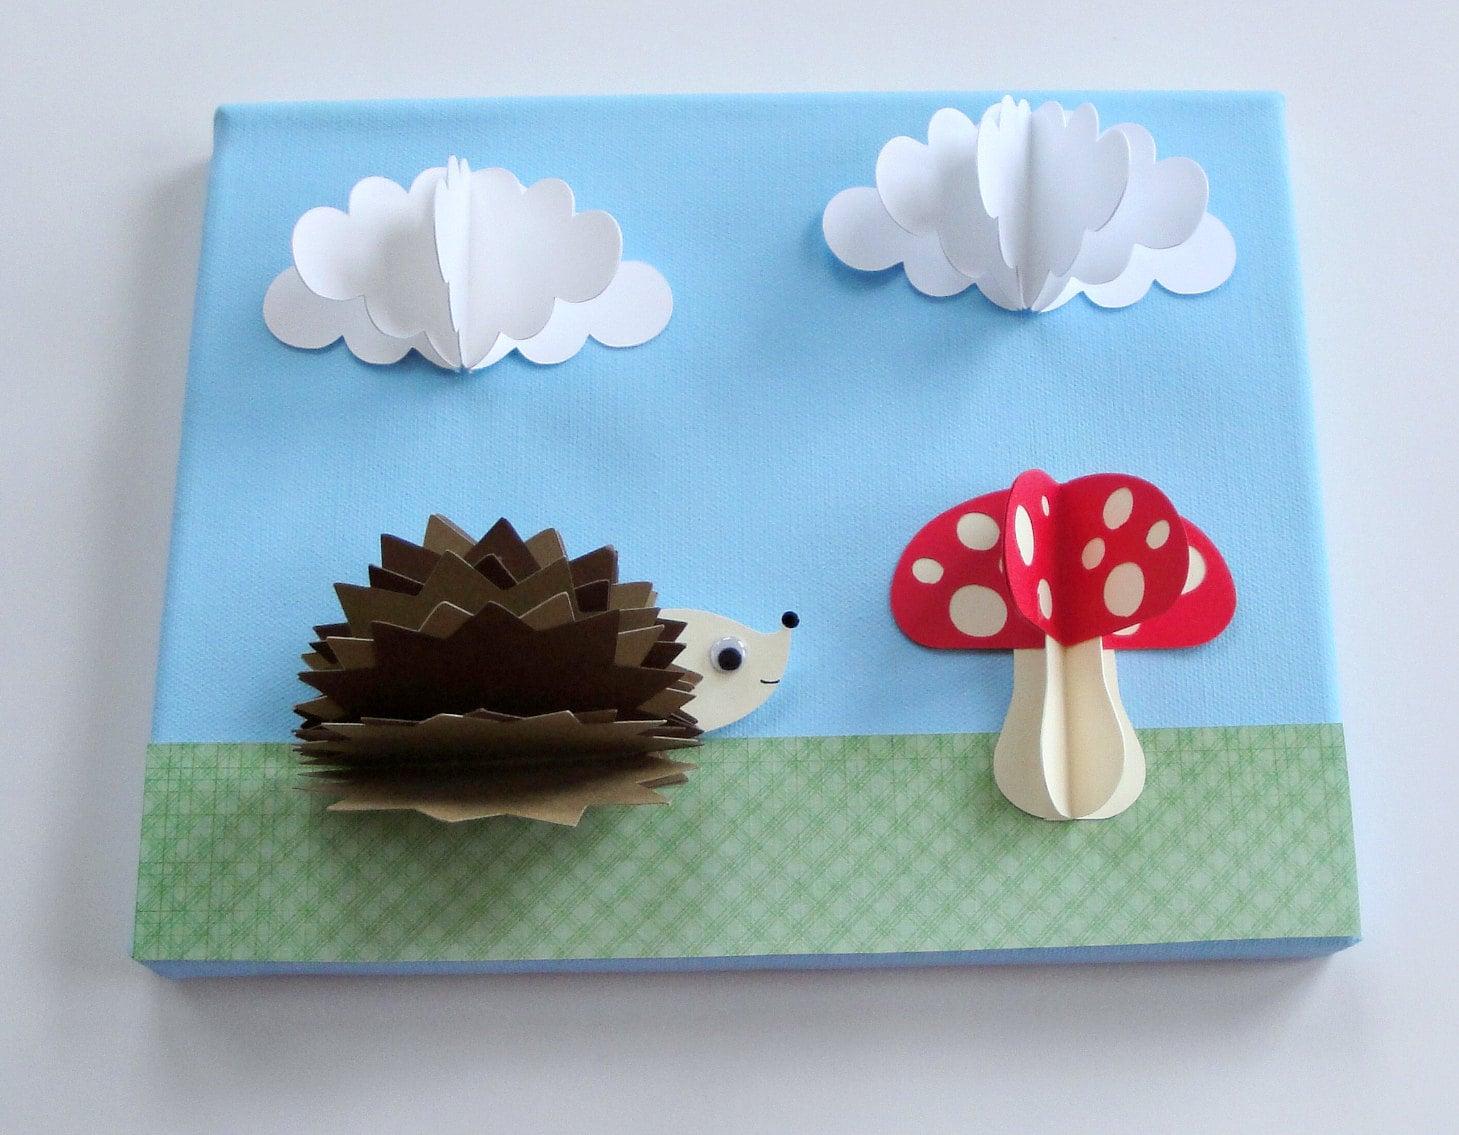 Original hedgehog and mushroom 3d paper wall art on 8 x 10 for 3d art projects